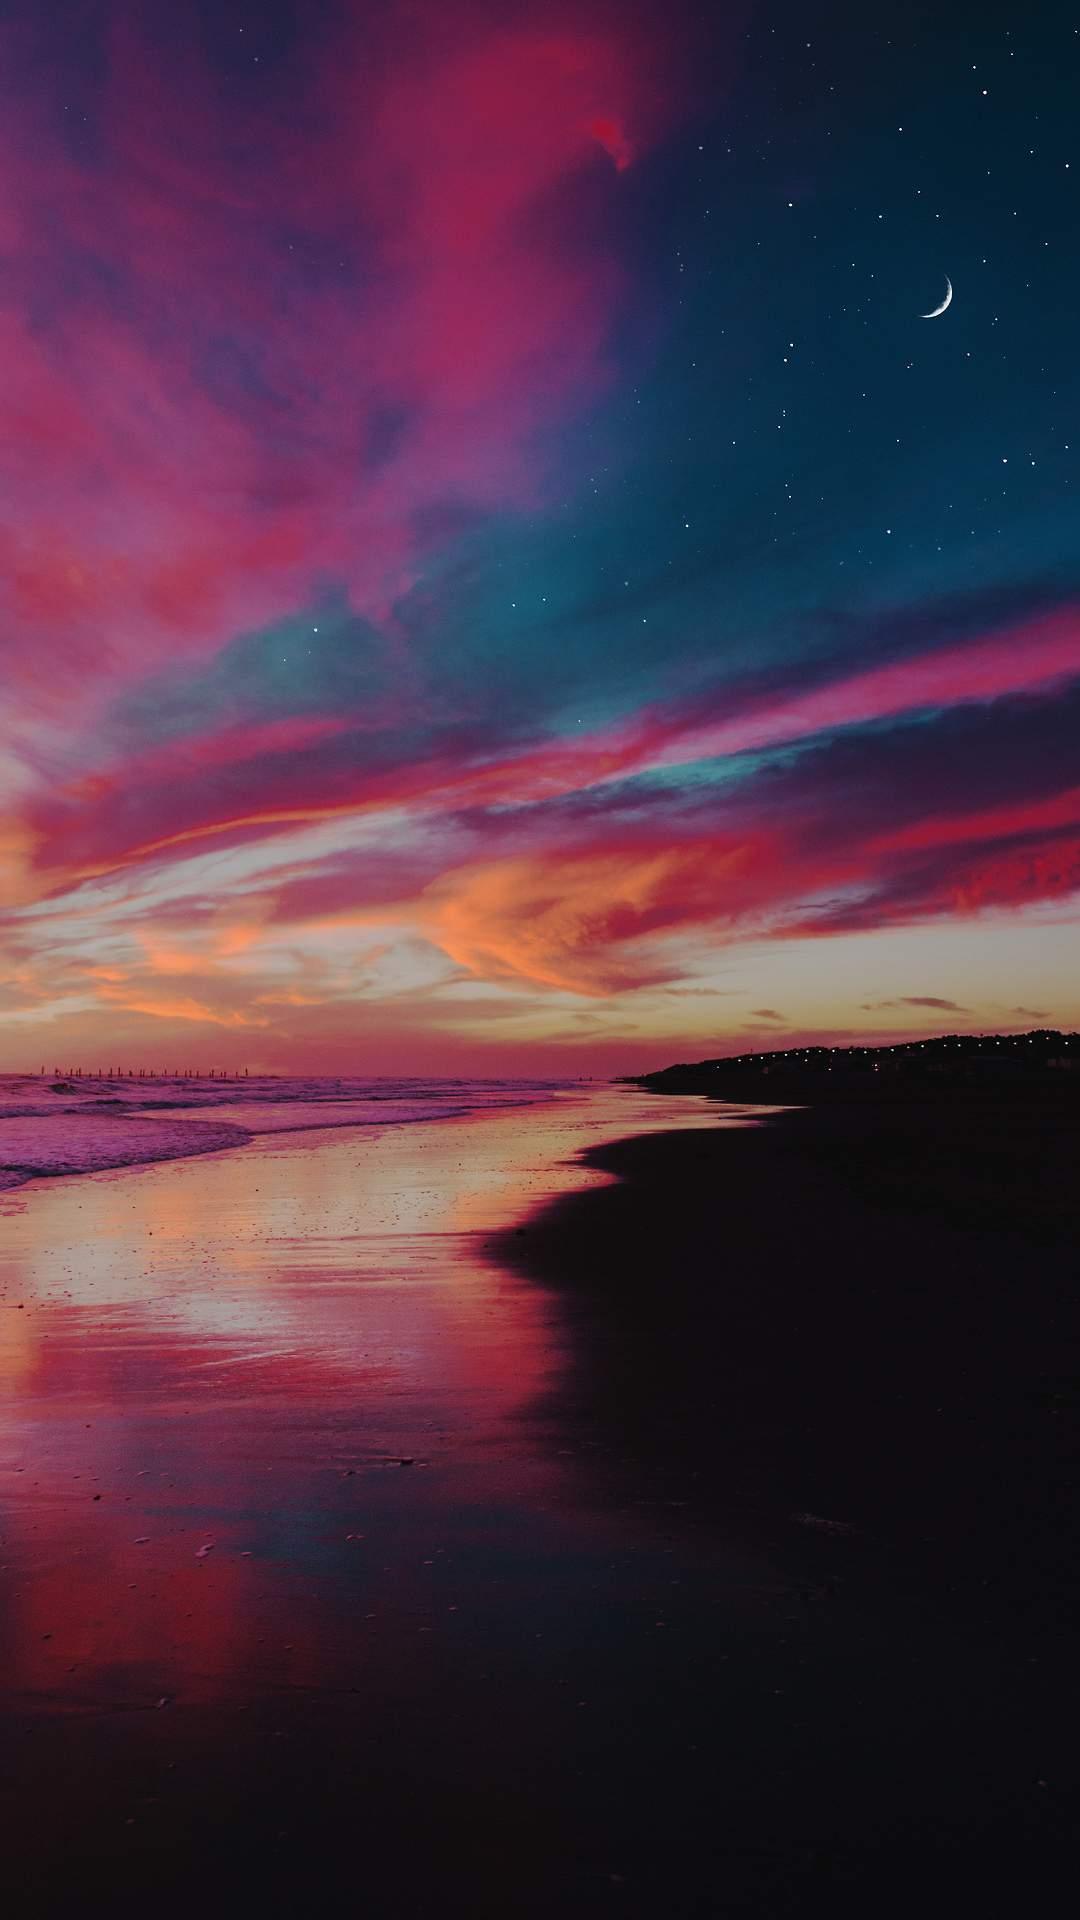 Beach Horizon Starry Sky Sunset iPhone Wallpaper